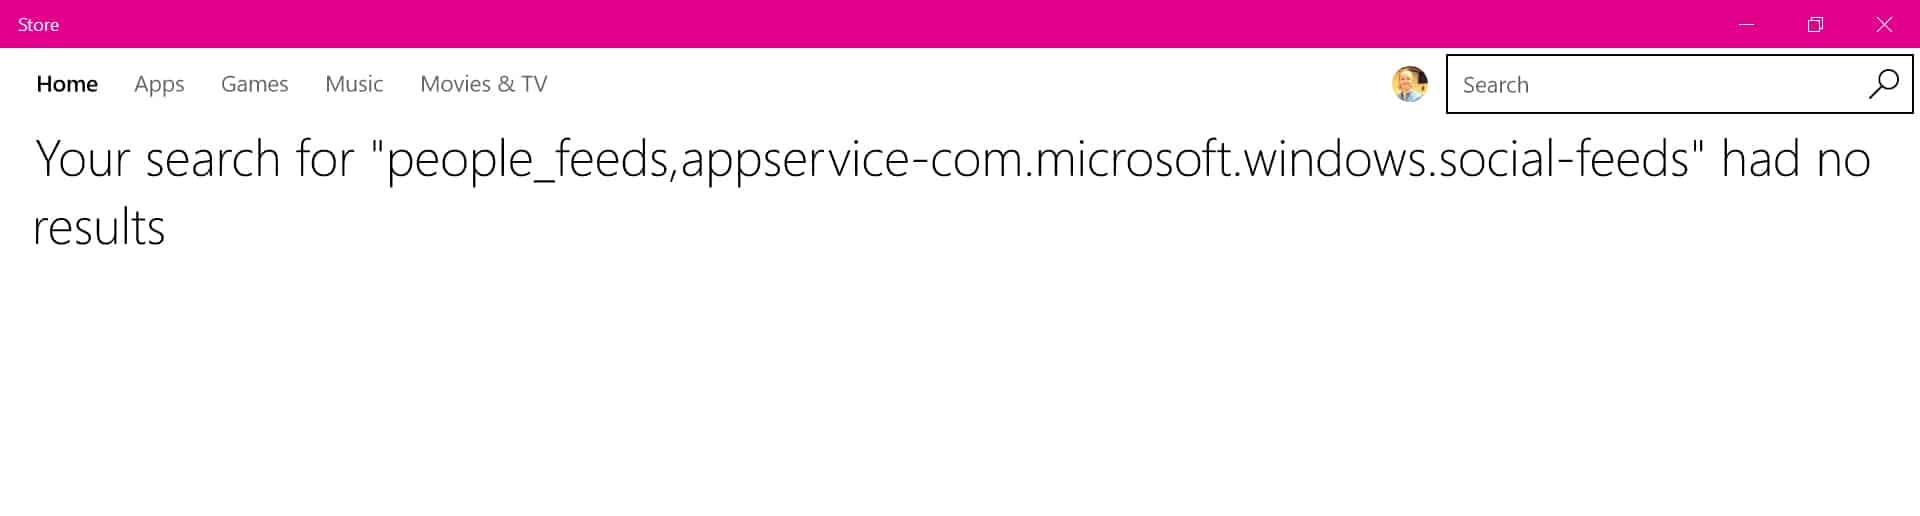 Windows 10 People App Error Message